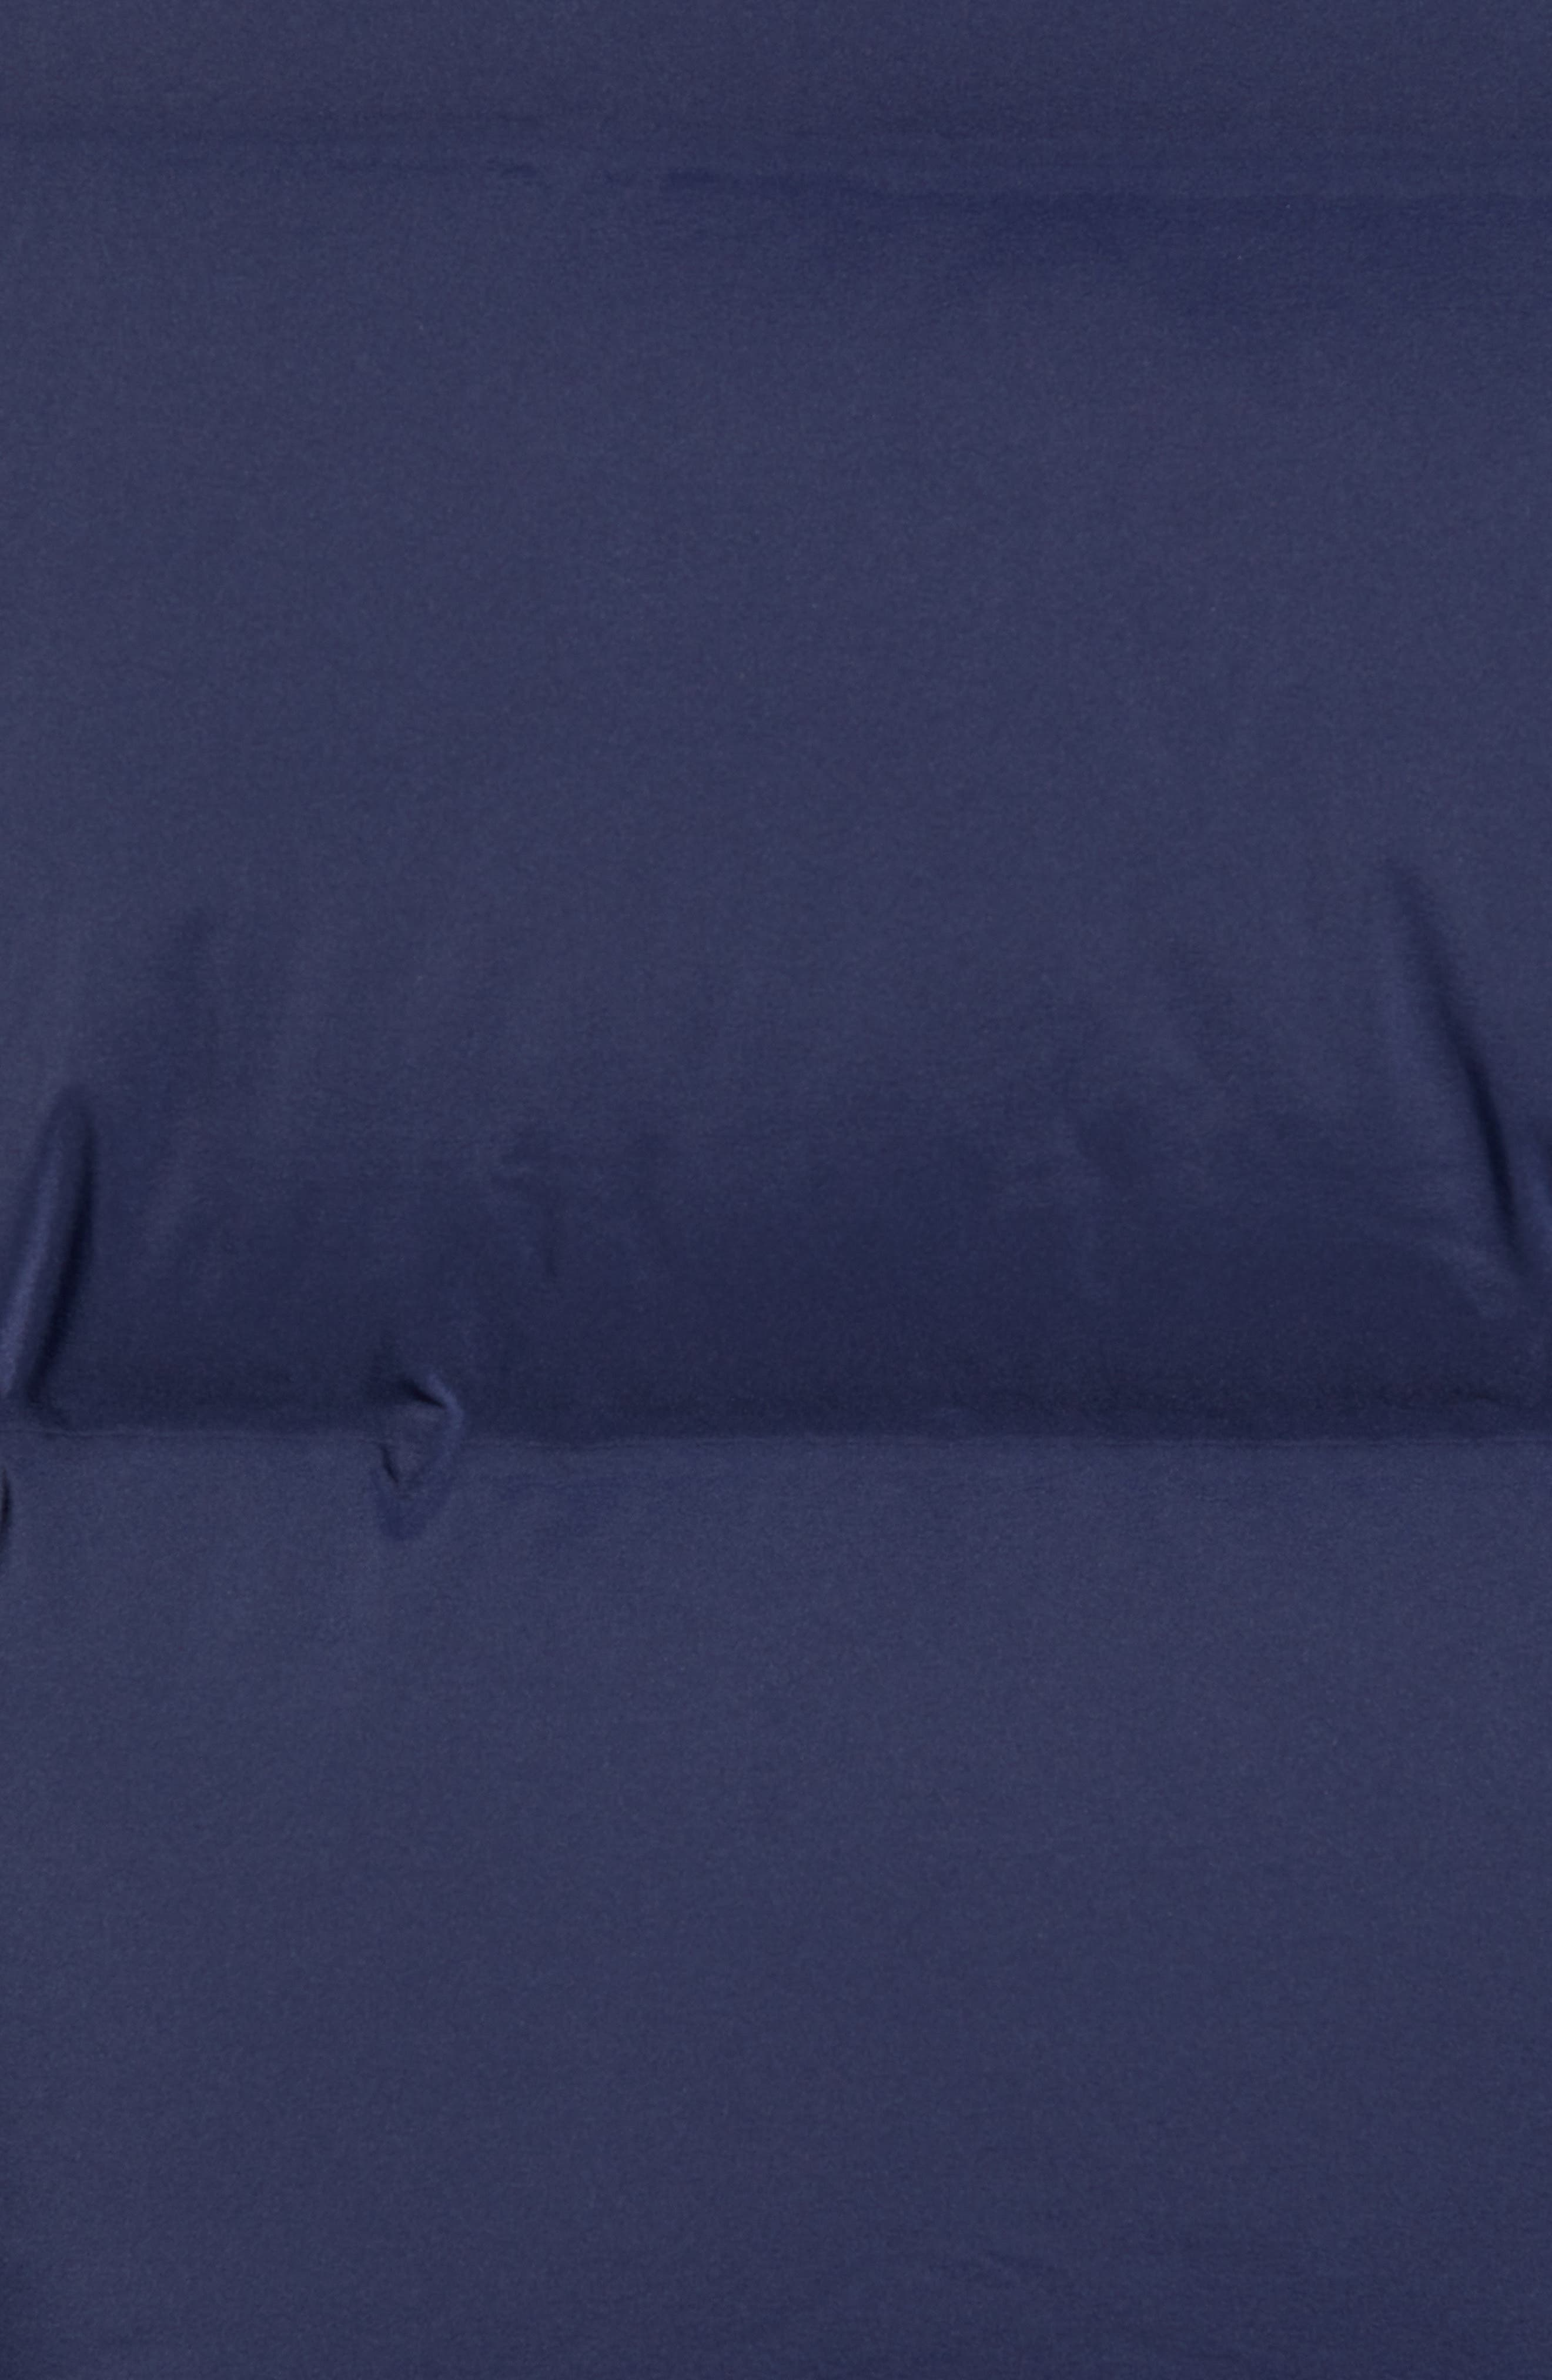 Colorblock Down Jacket,                             Alternate thumbnail 7, color,                             BLACK IRIS / MULTI